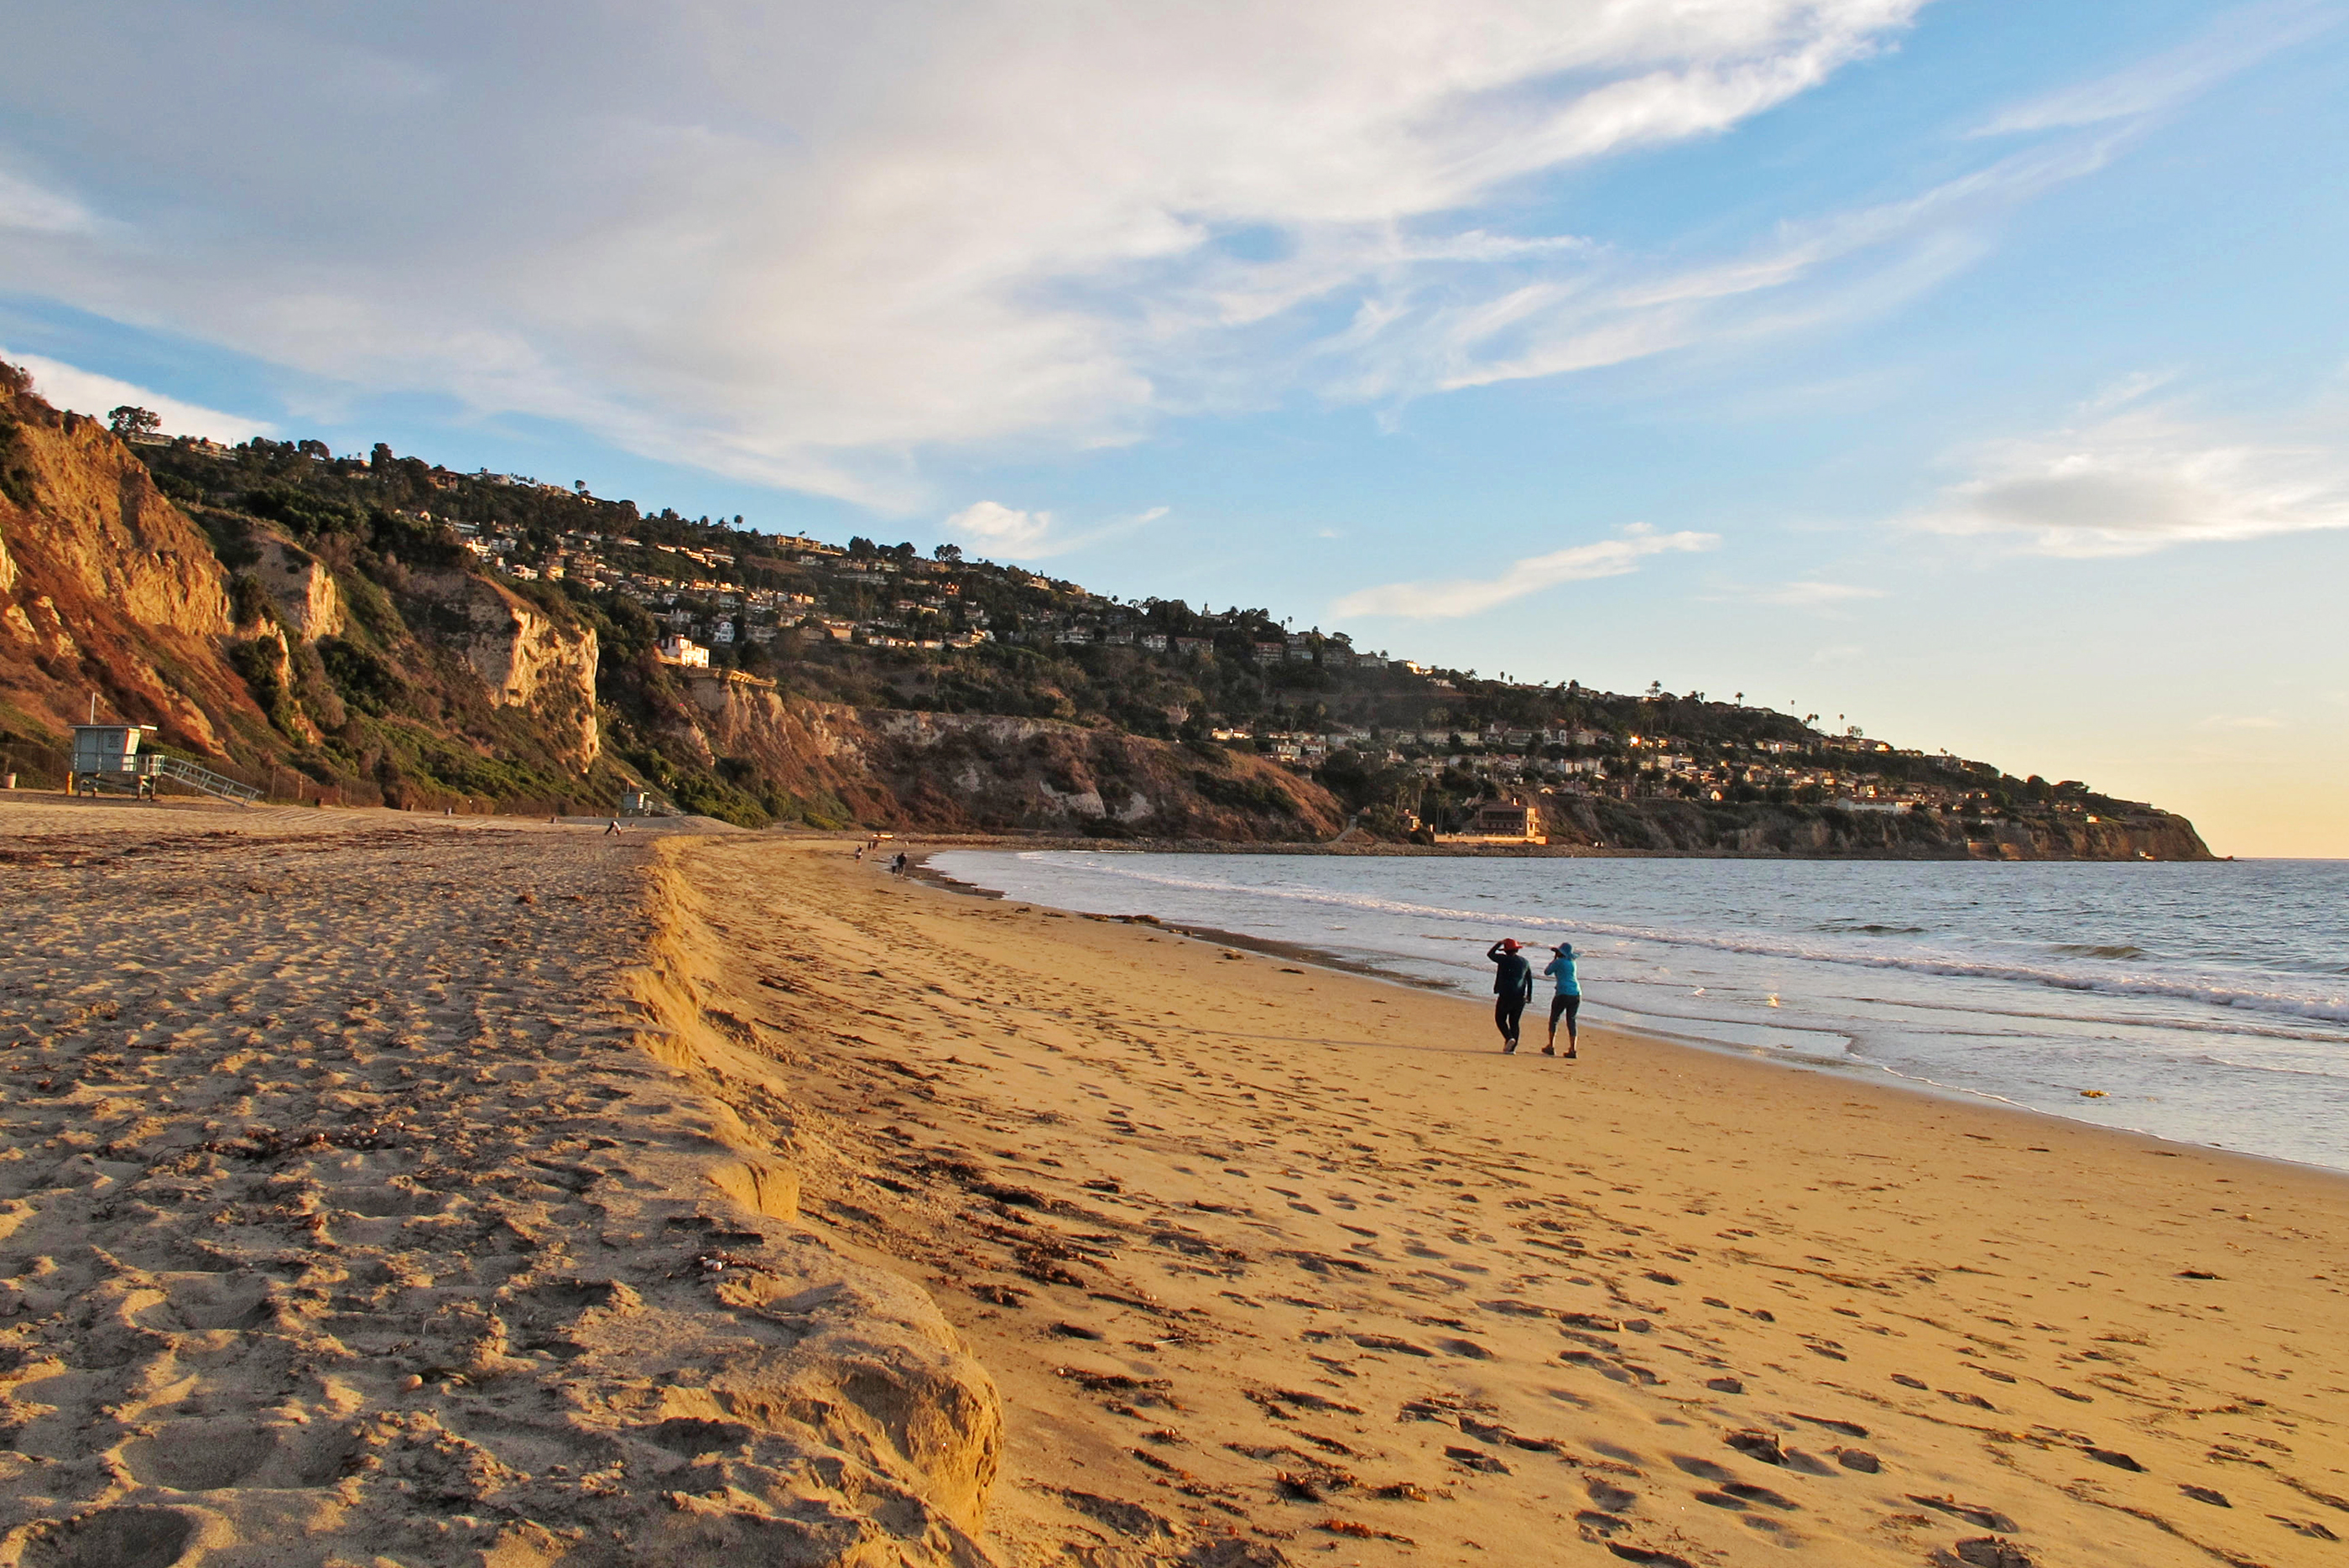 Pair Walking along the shore at Torrance Beach, Los Angeles, California